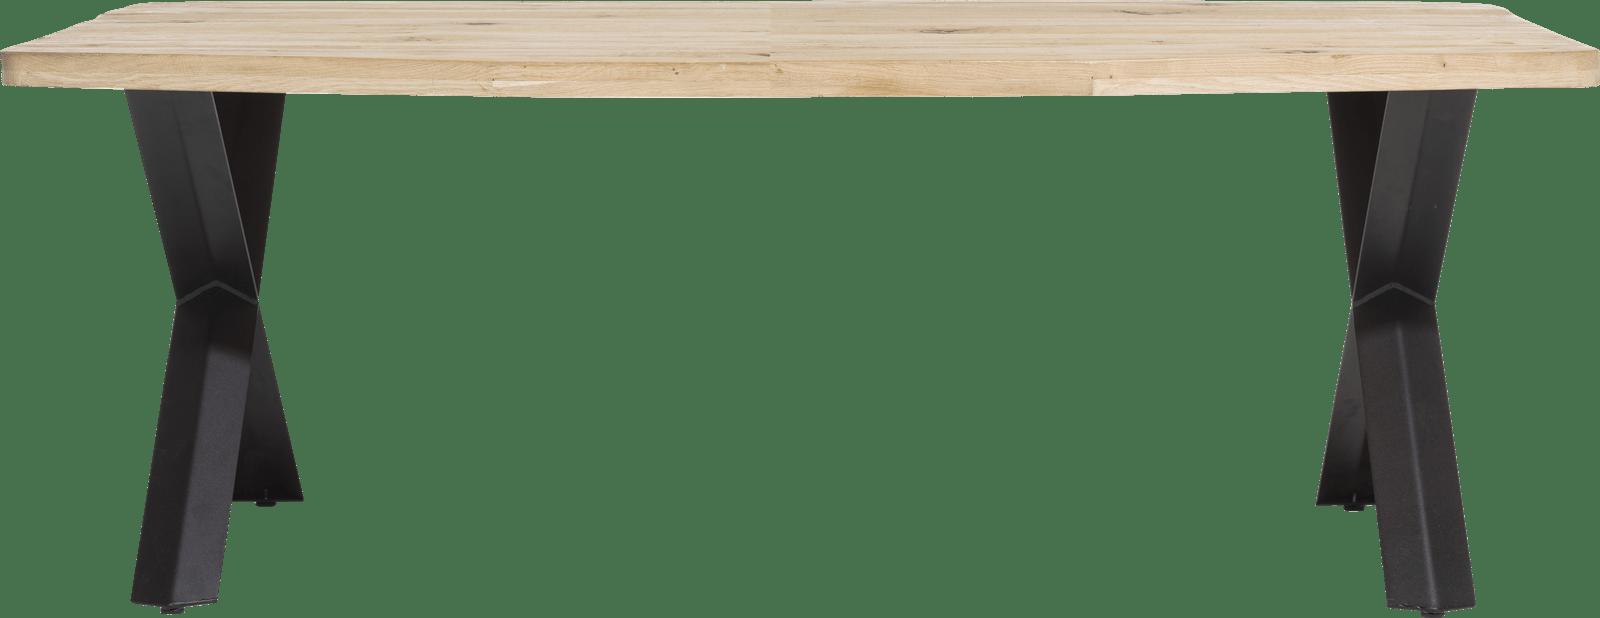 Maddox - table 220 x 100 cm - bois - pied forme x